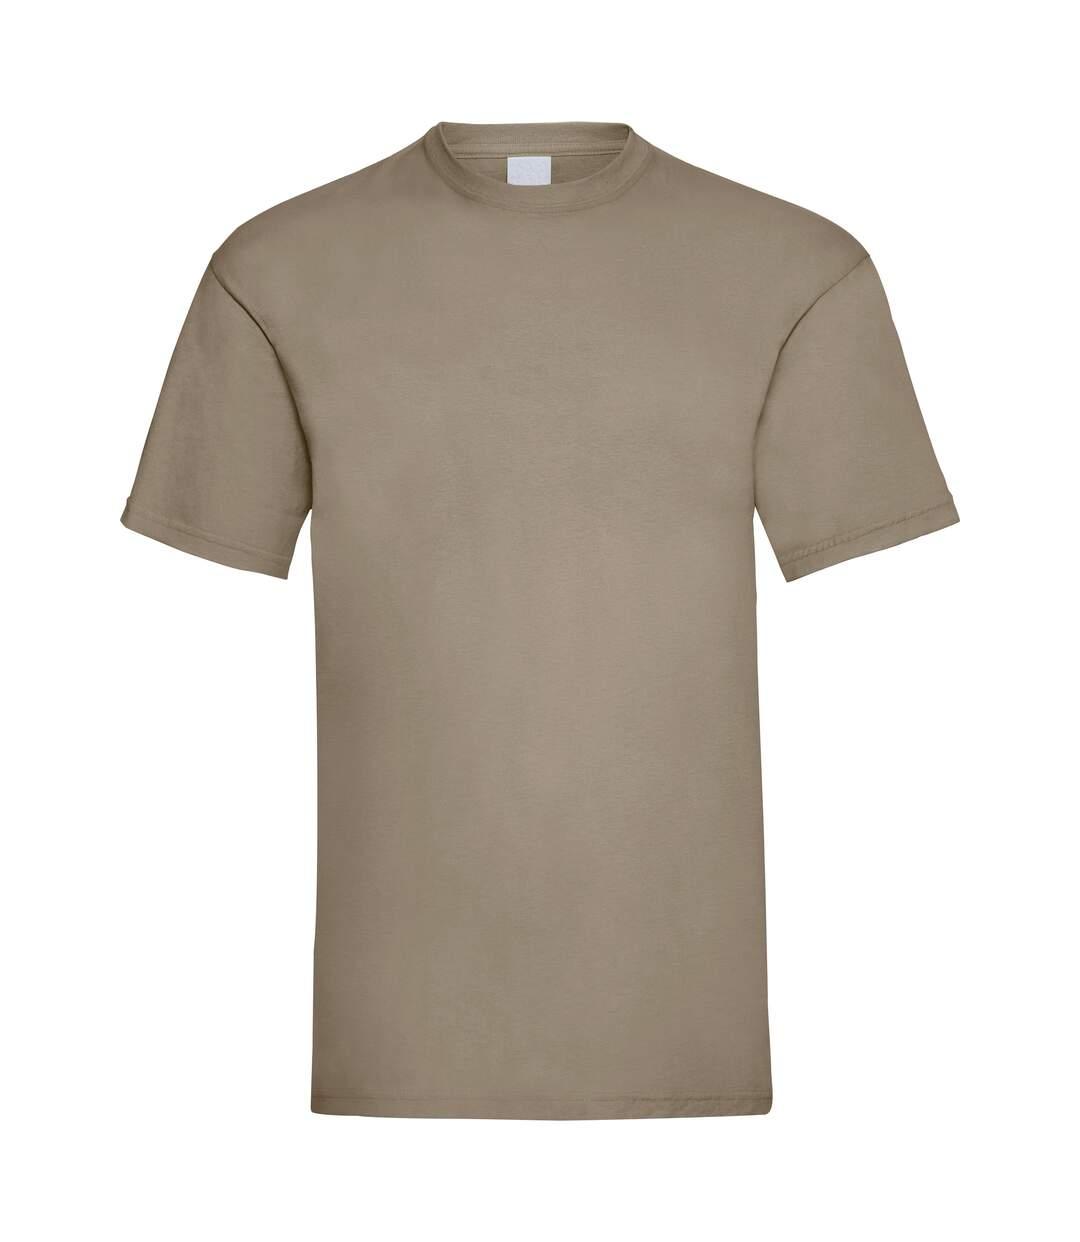 Mens Value Short Sleeve Casual T-Shirt (Sand) - UTBC3900